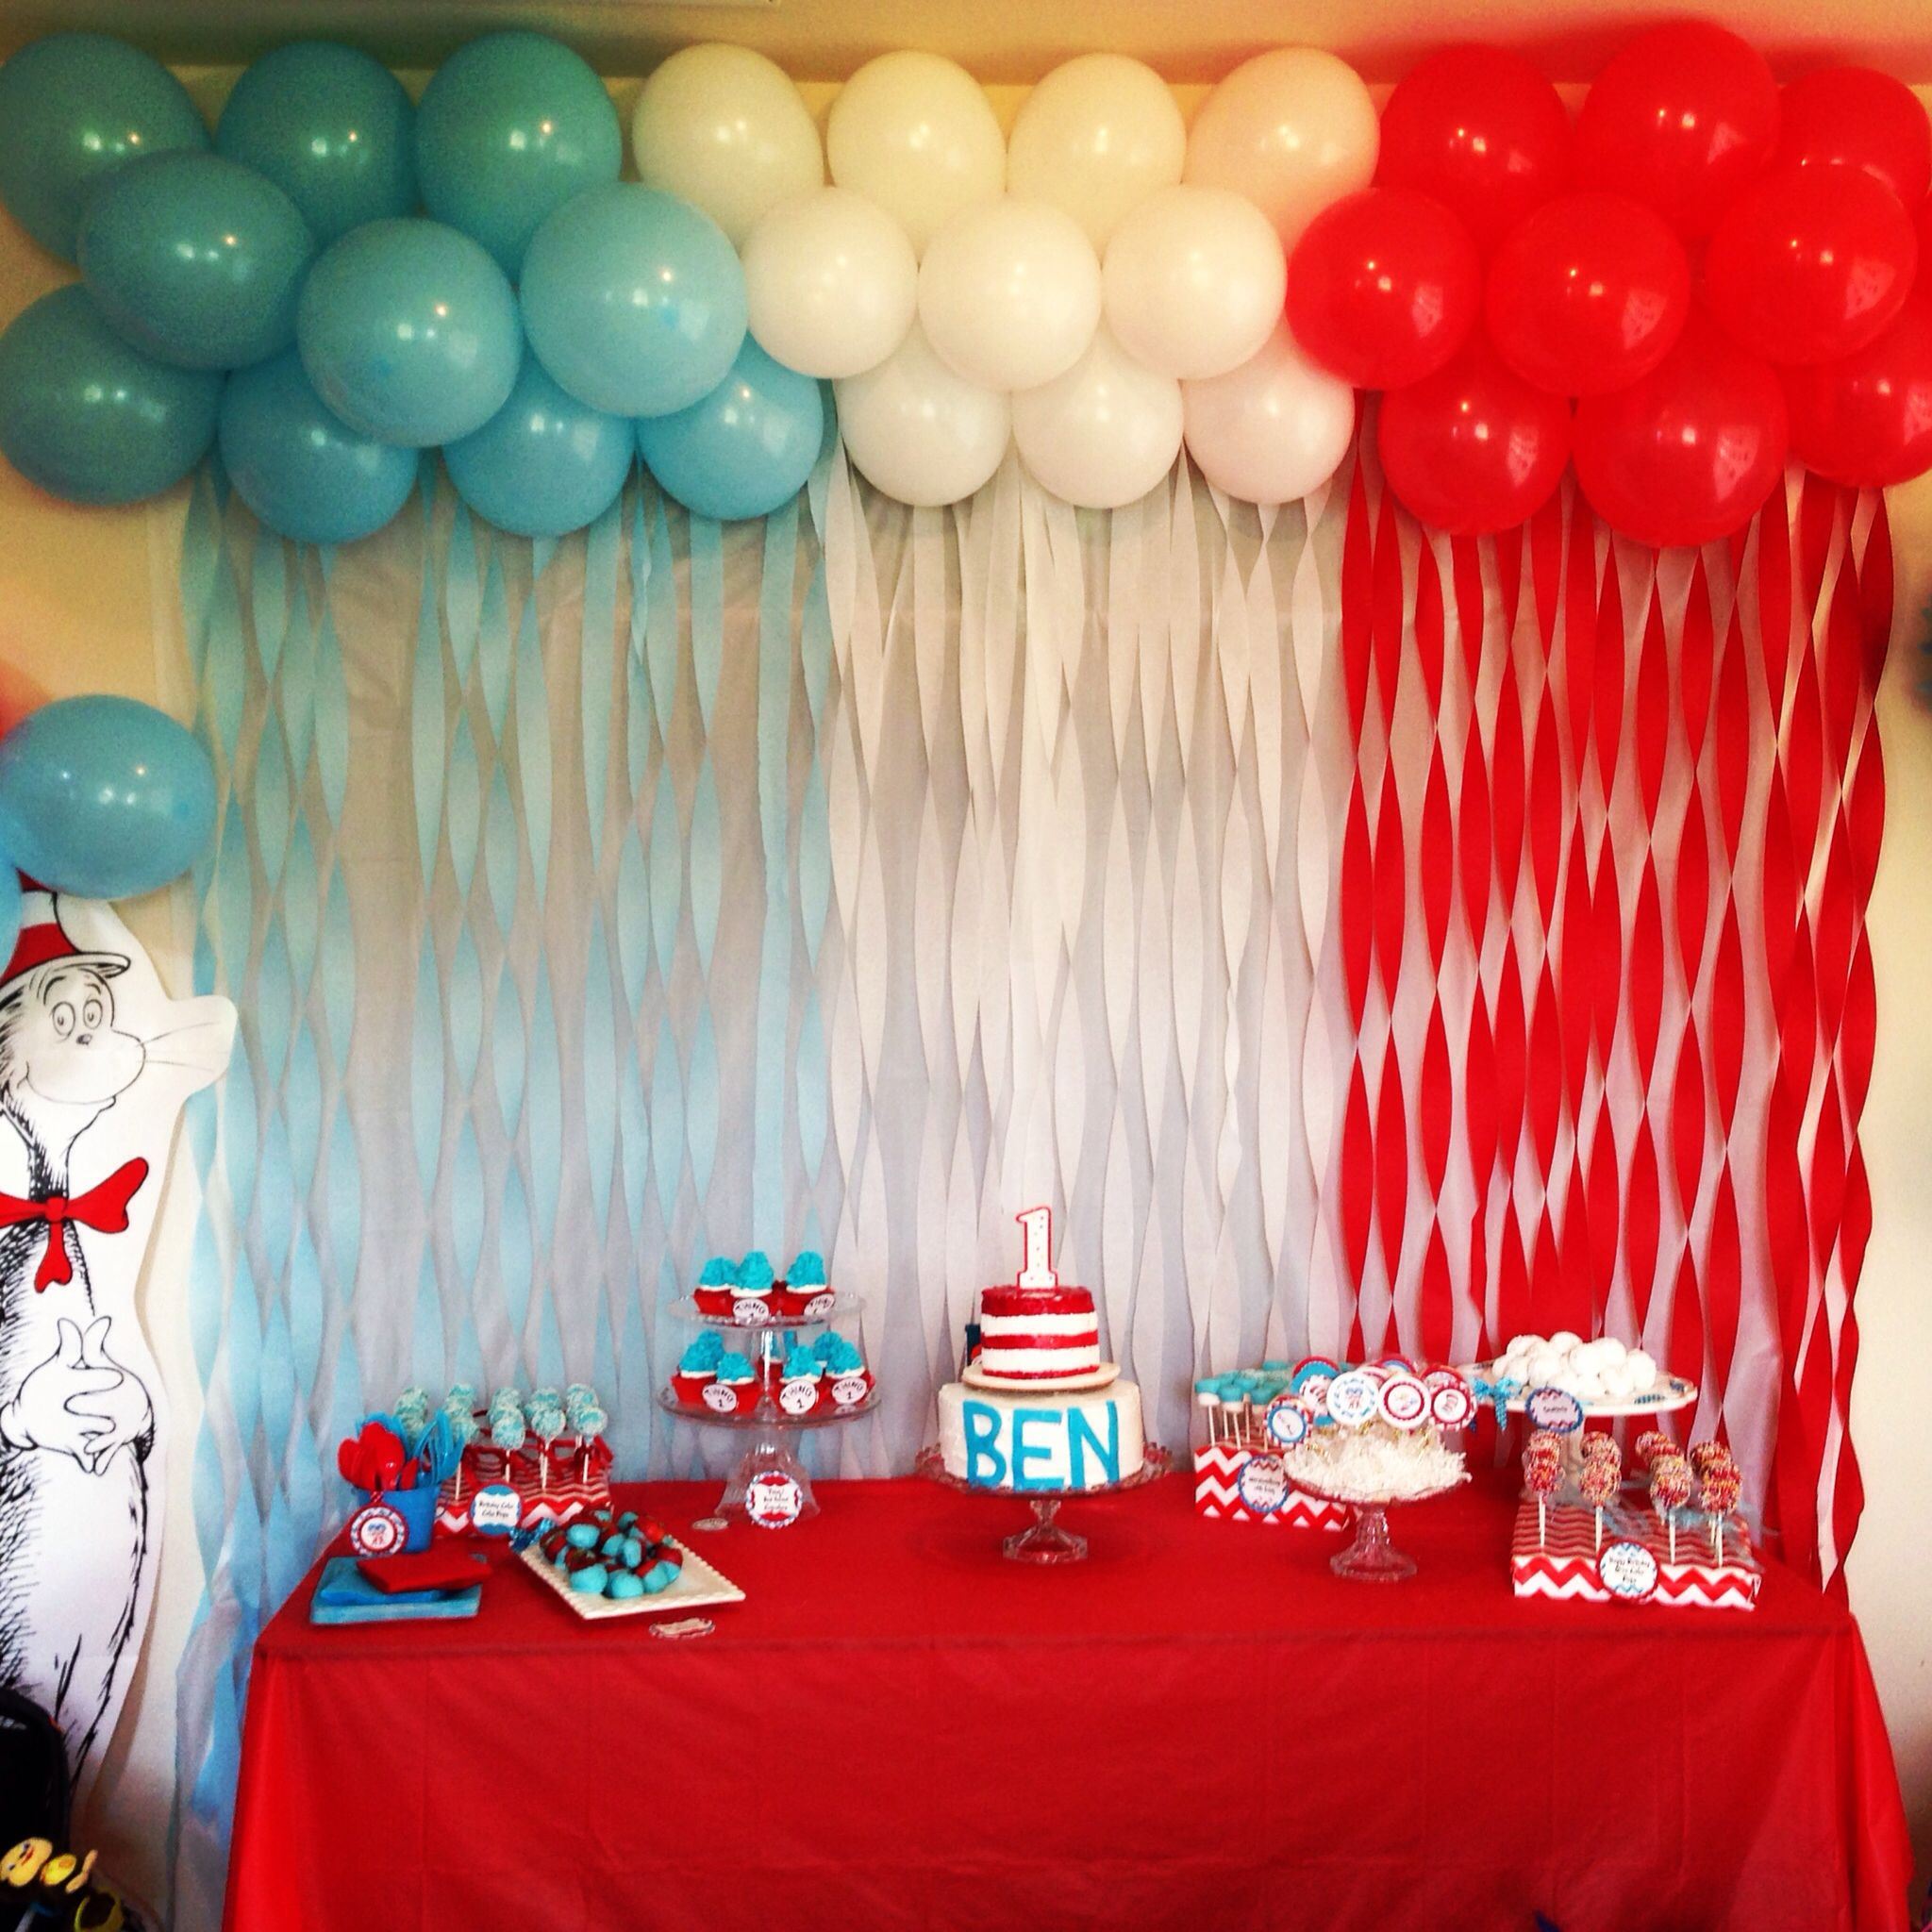 Dr Suess birthday party Birthday ideas Pinterest Birthdays